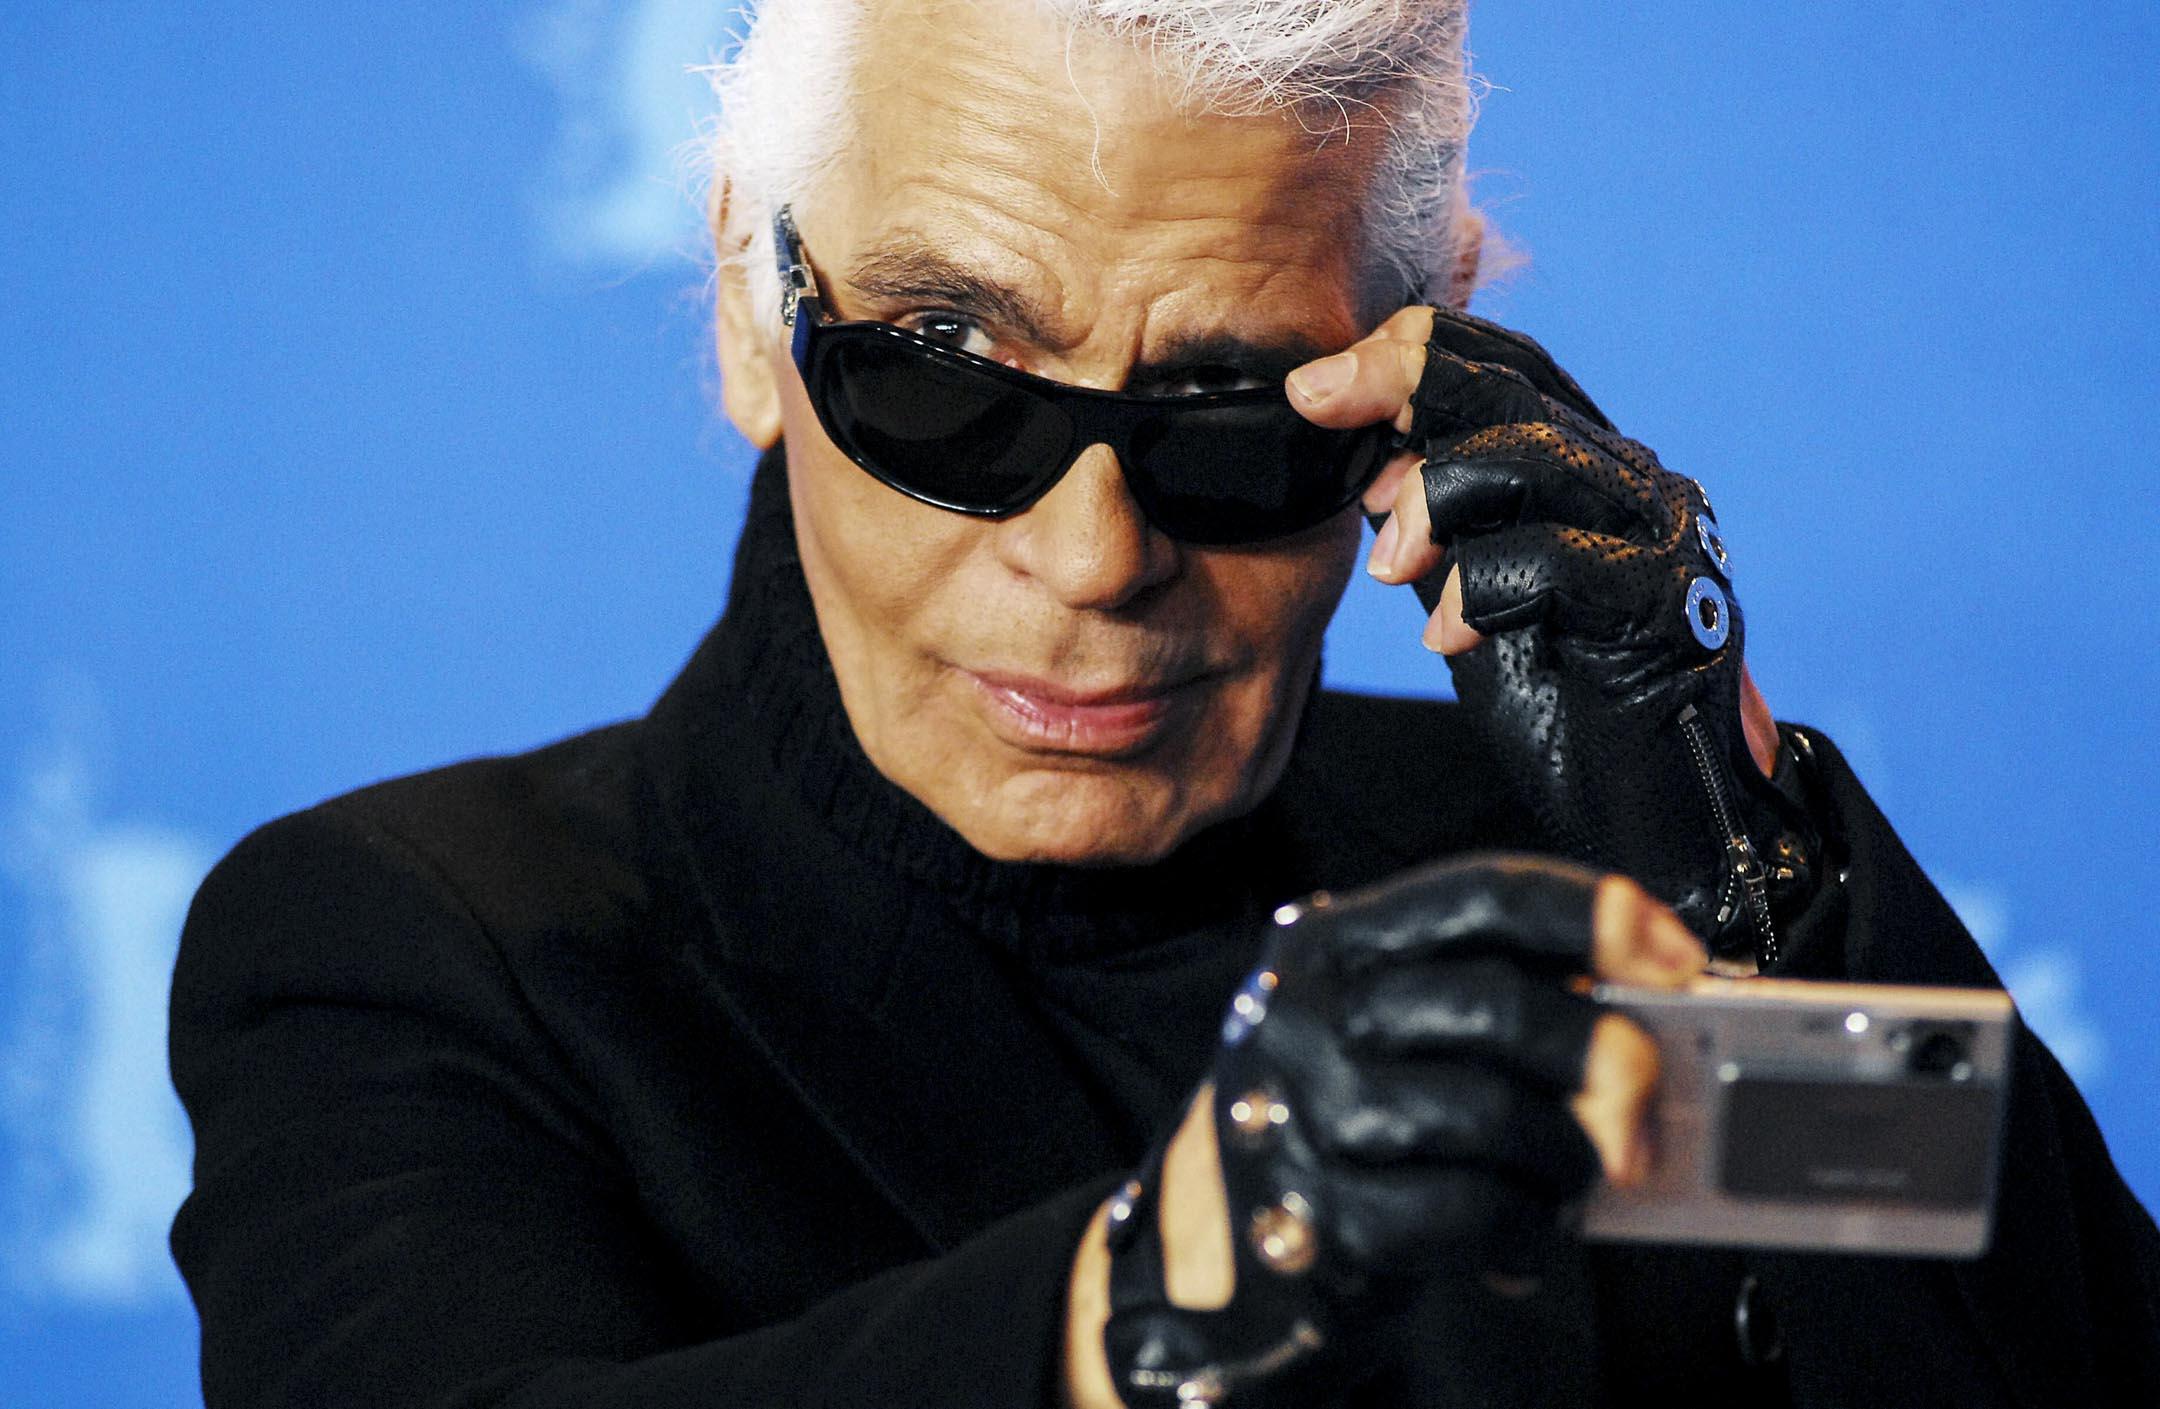 2019年2月19日,Karl Lagerfeld因病於巴黎去世,享年85歲。 攝:Imagine China